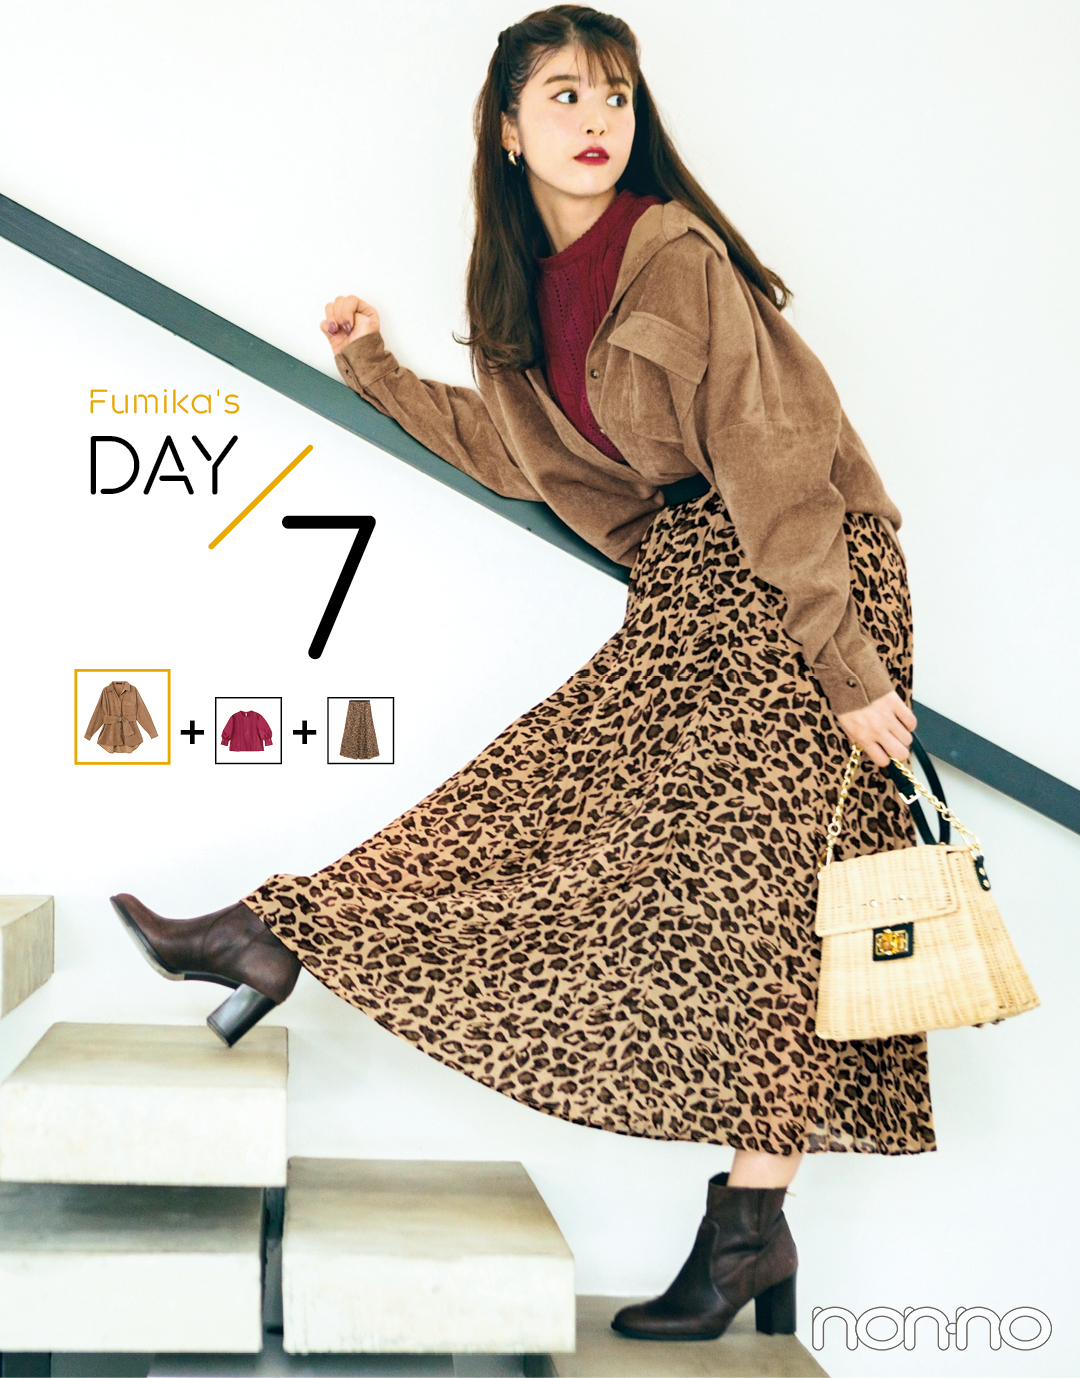 Fumika's DAY7